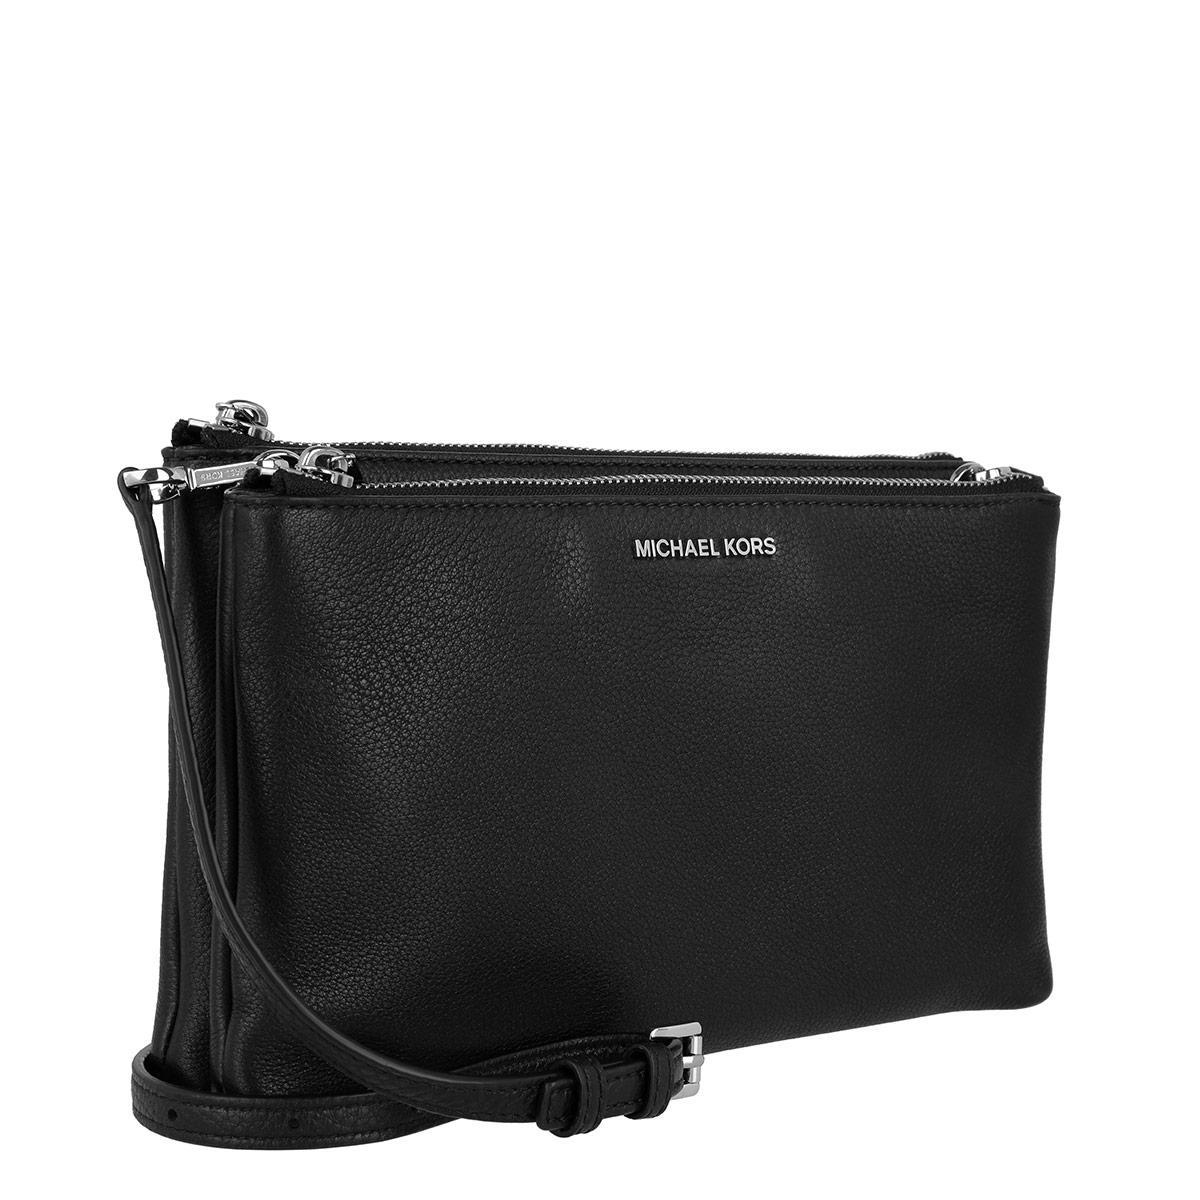 e2120ab6e1db Michael Kors Adele Double Zip Crossbody Leather Black in Black - Lyst